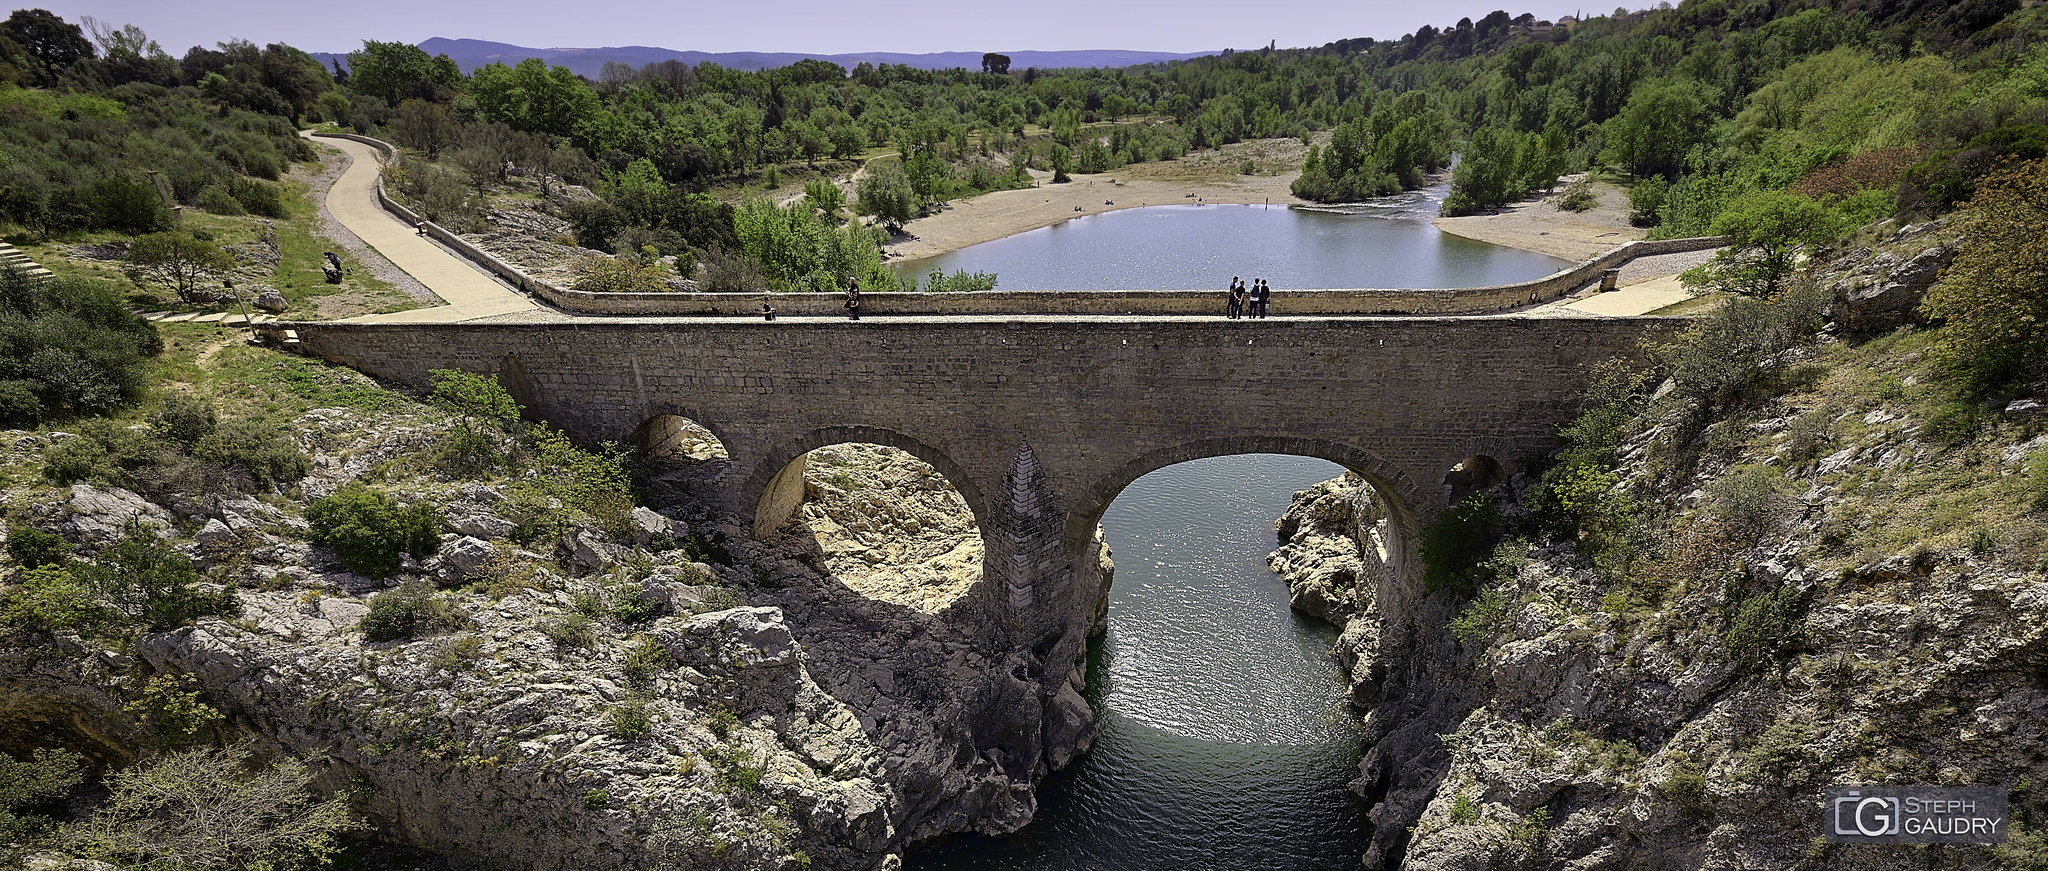 Pont du Diable (Saint-Jean-de-Fos) 2019_04_19_130702-cine [Klik om de diavoorstelling te starten]